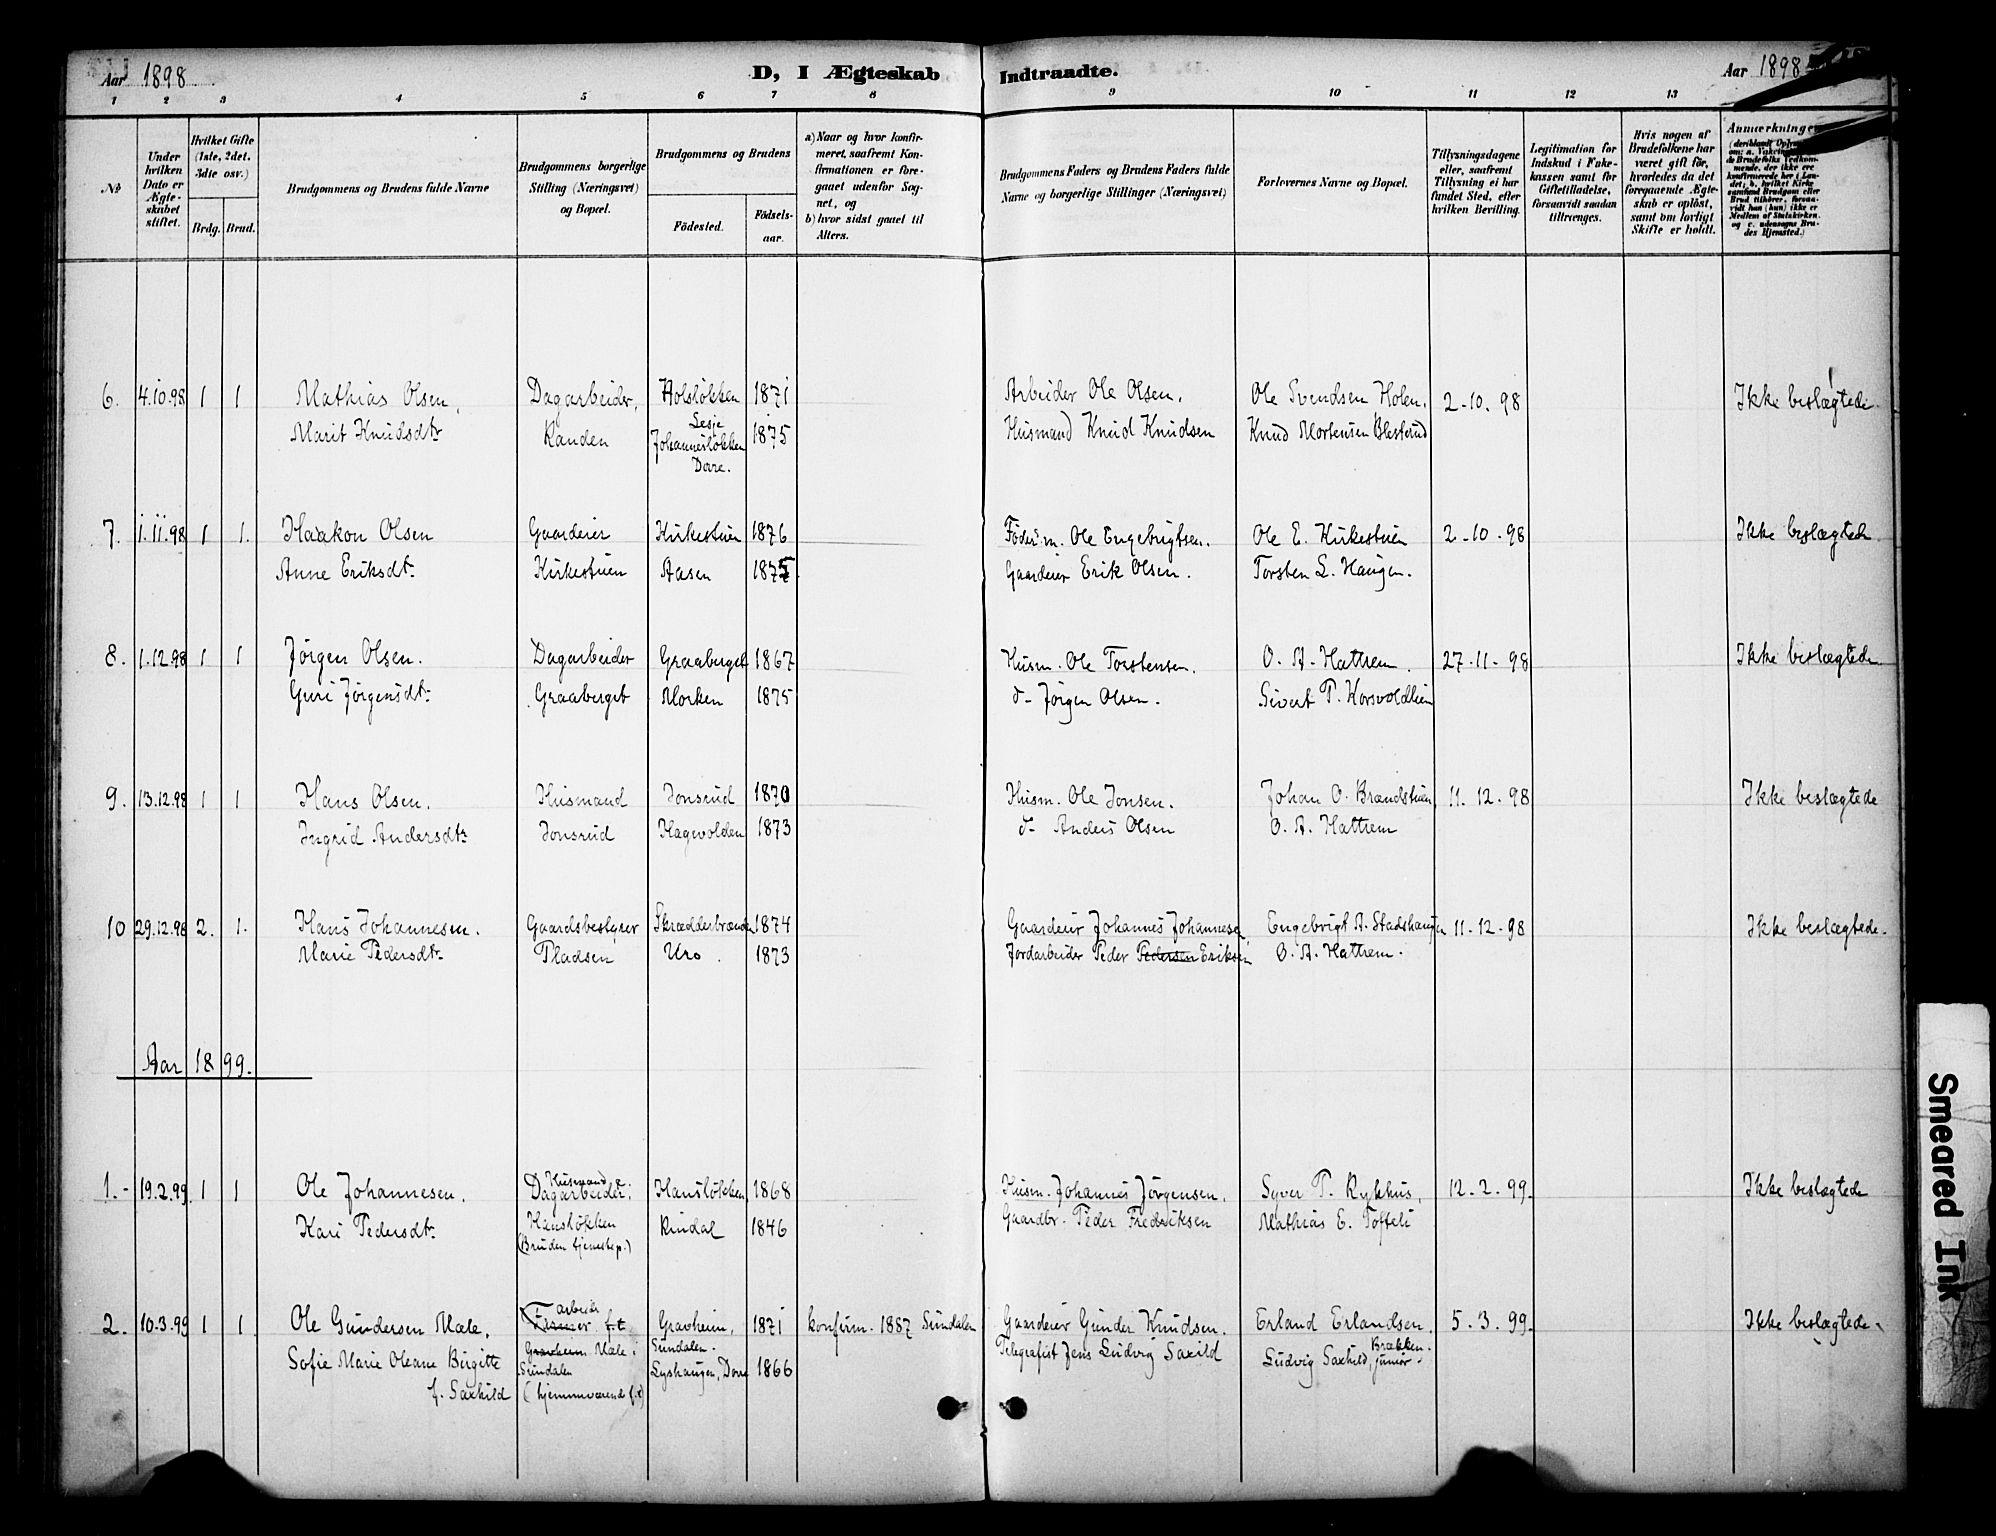 SAH, Dovre prestekontor, Ministerialbok nr. 3, 1891-1901, s. 142